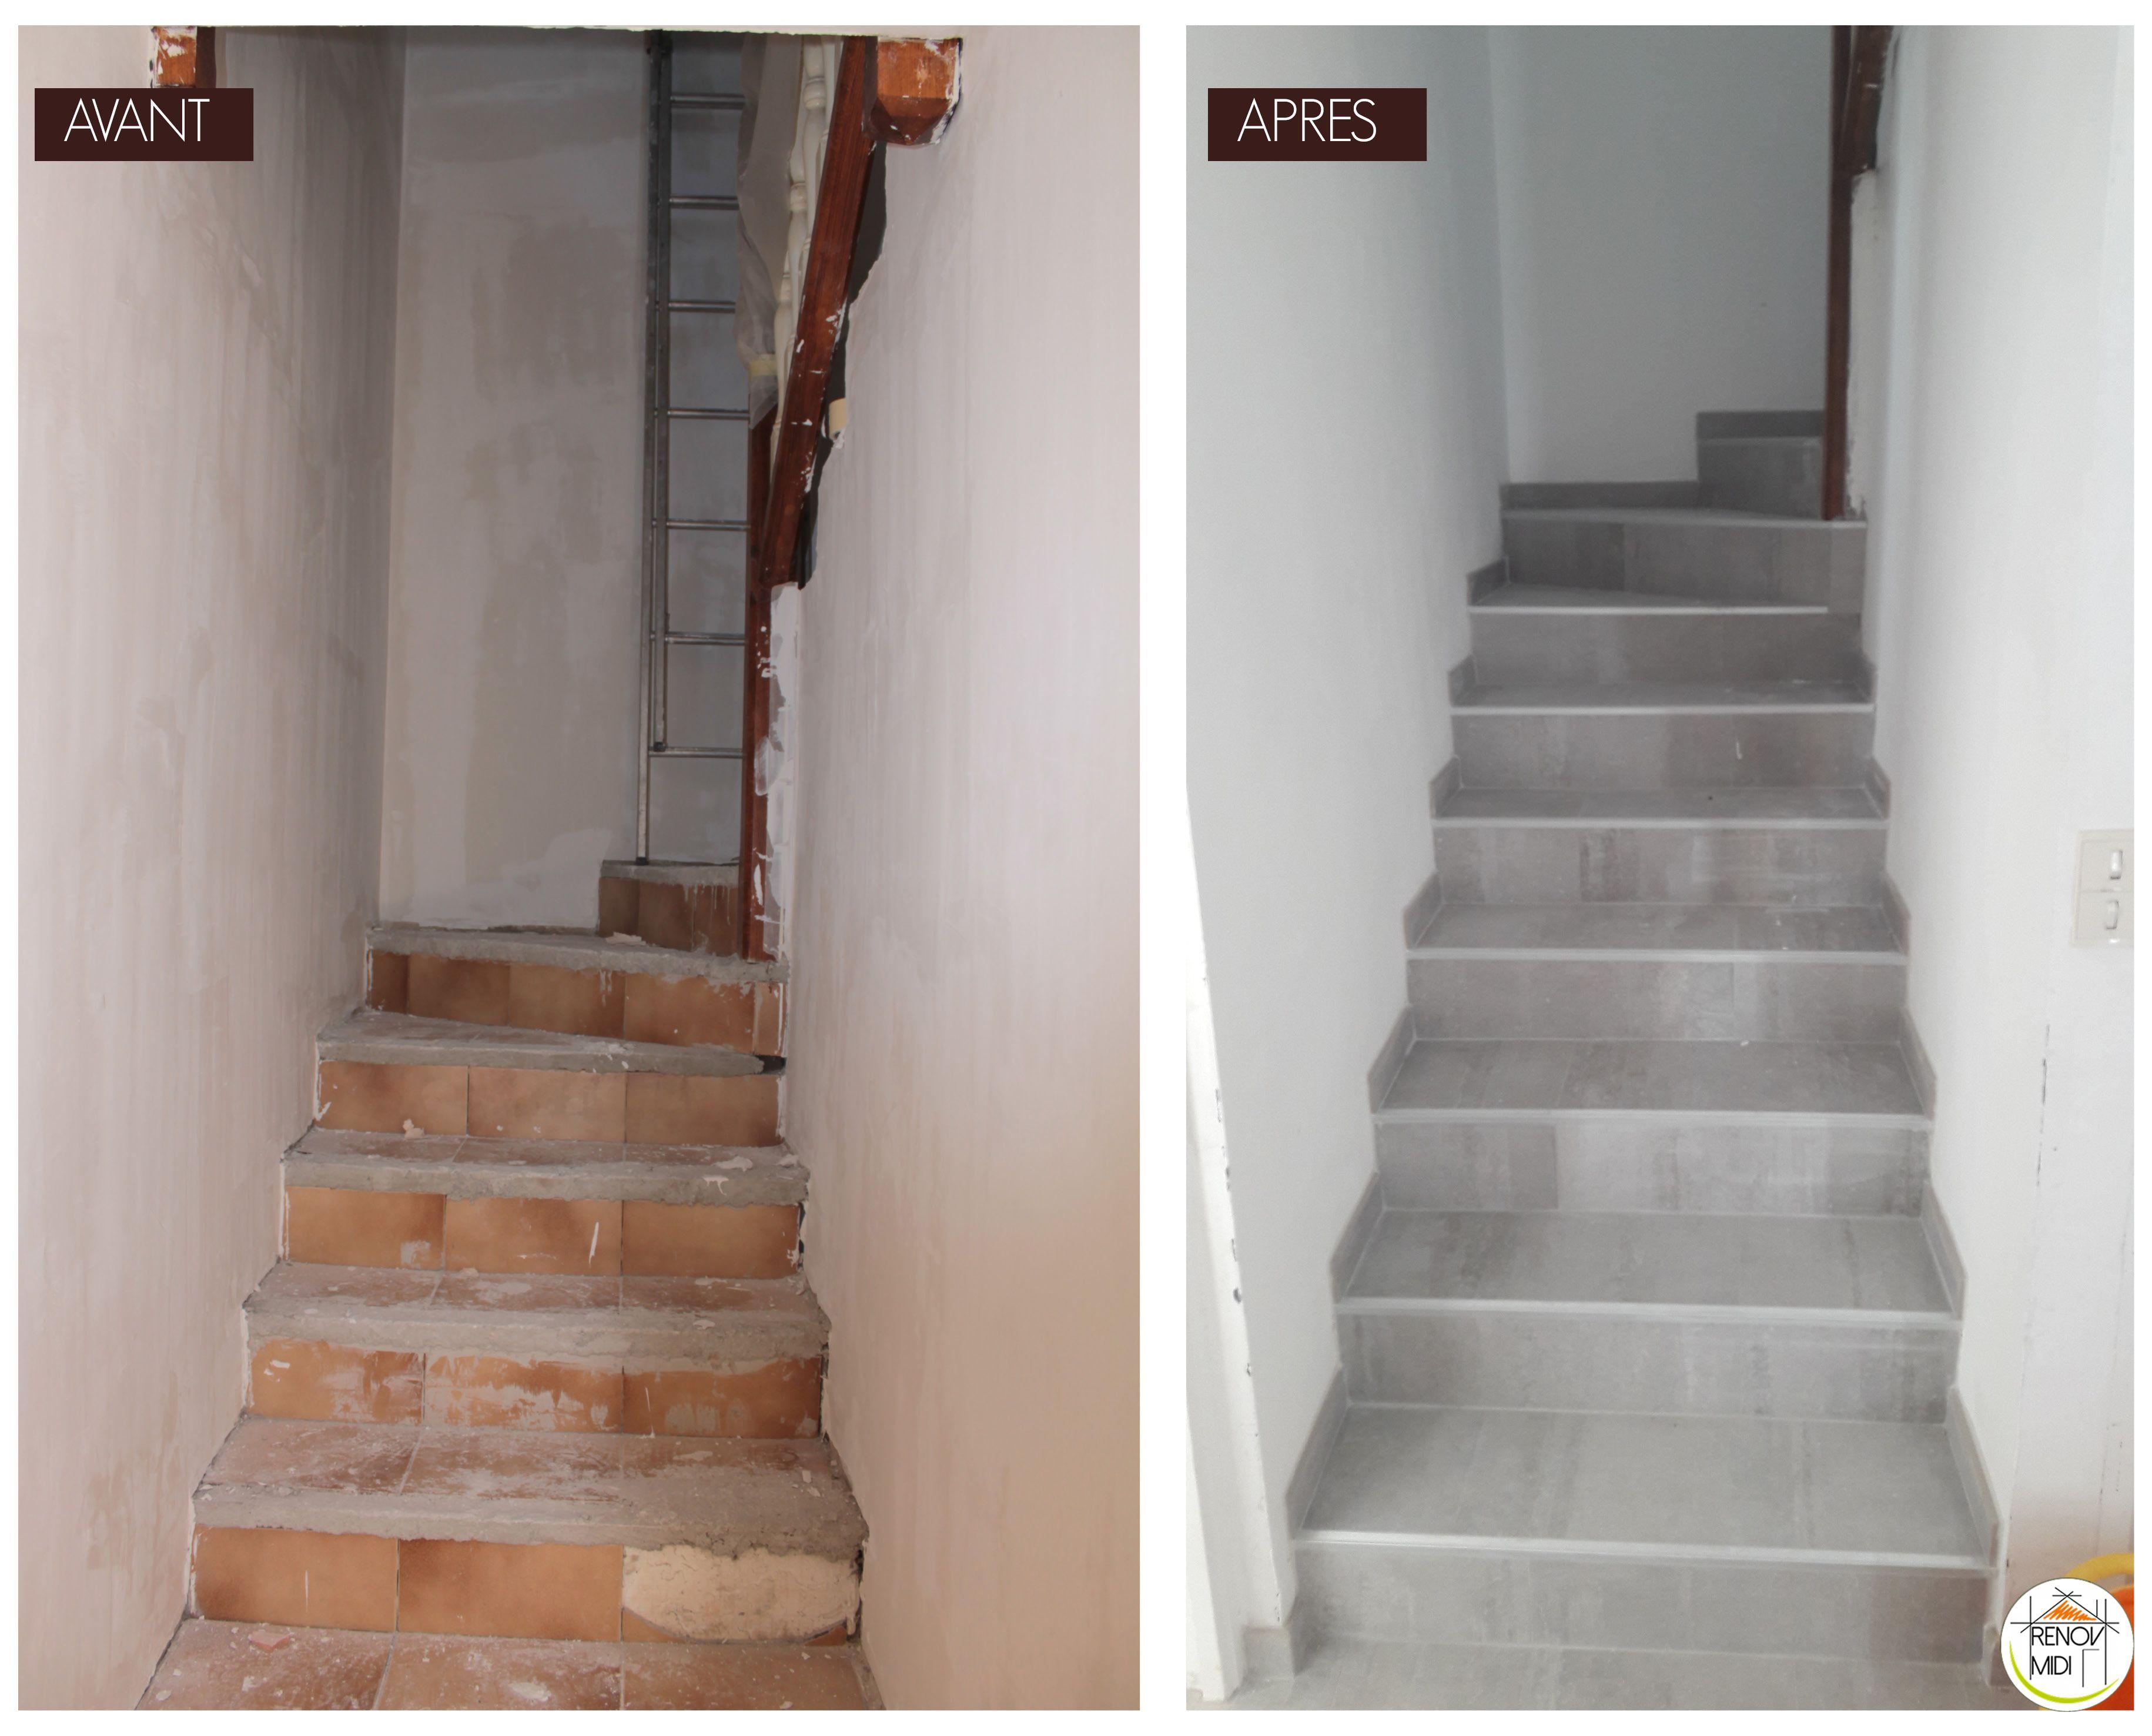 Renovation Escalier Carrelage Escalier Carrelage Renover Escalier Escalier